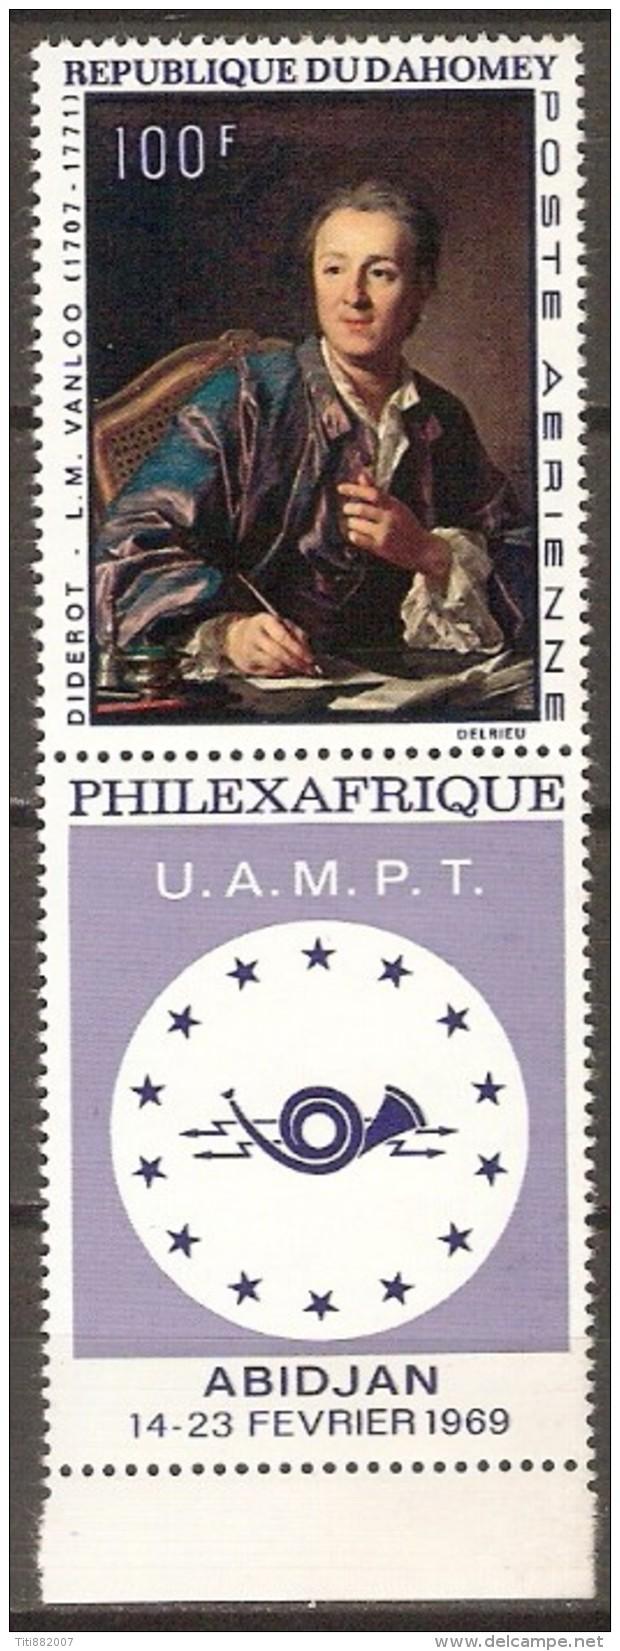 DAHOMEY   -   Aéro  -  UAMPT.  PHILEXFRANCE 14-23 Février 1969.  Abidjan.**. - Bénin – Dahomey (1960-...)